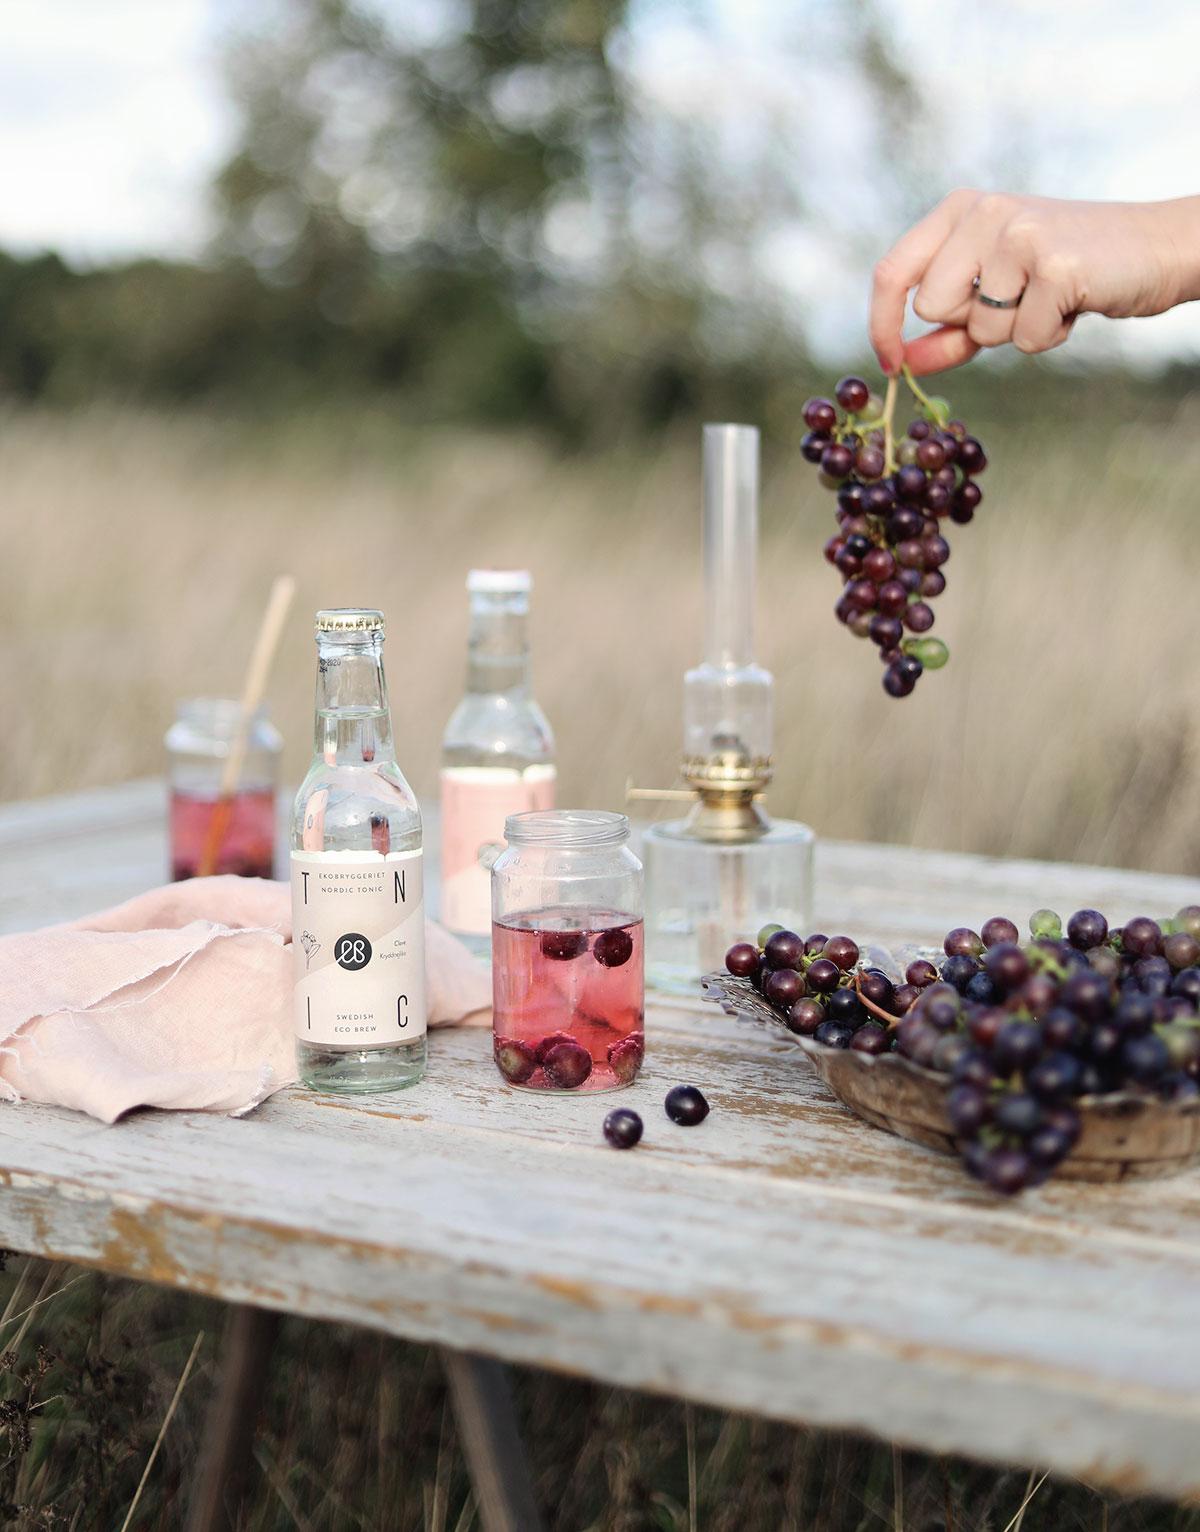 ekobryggeriet drinkar drink vindruvor Gotland soda